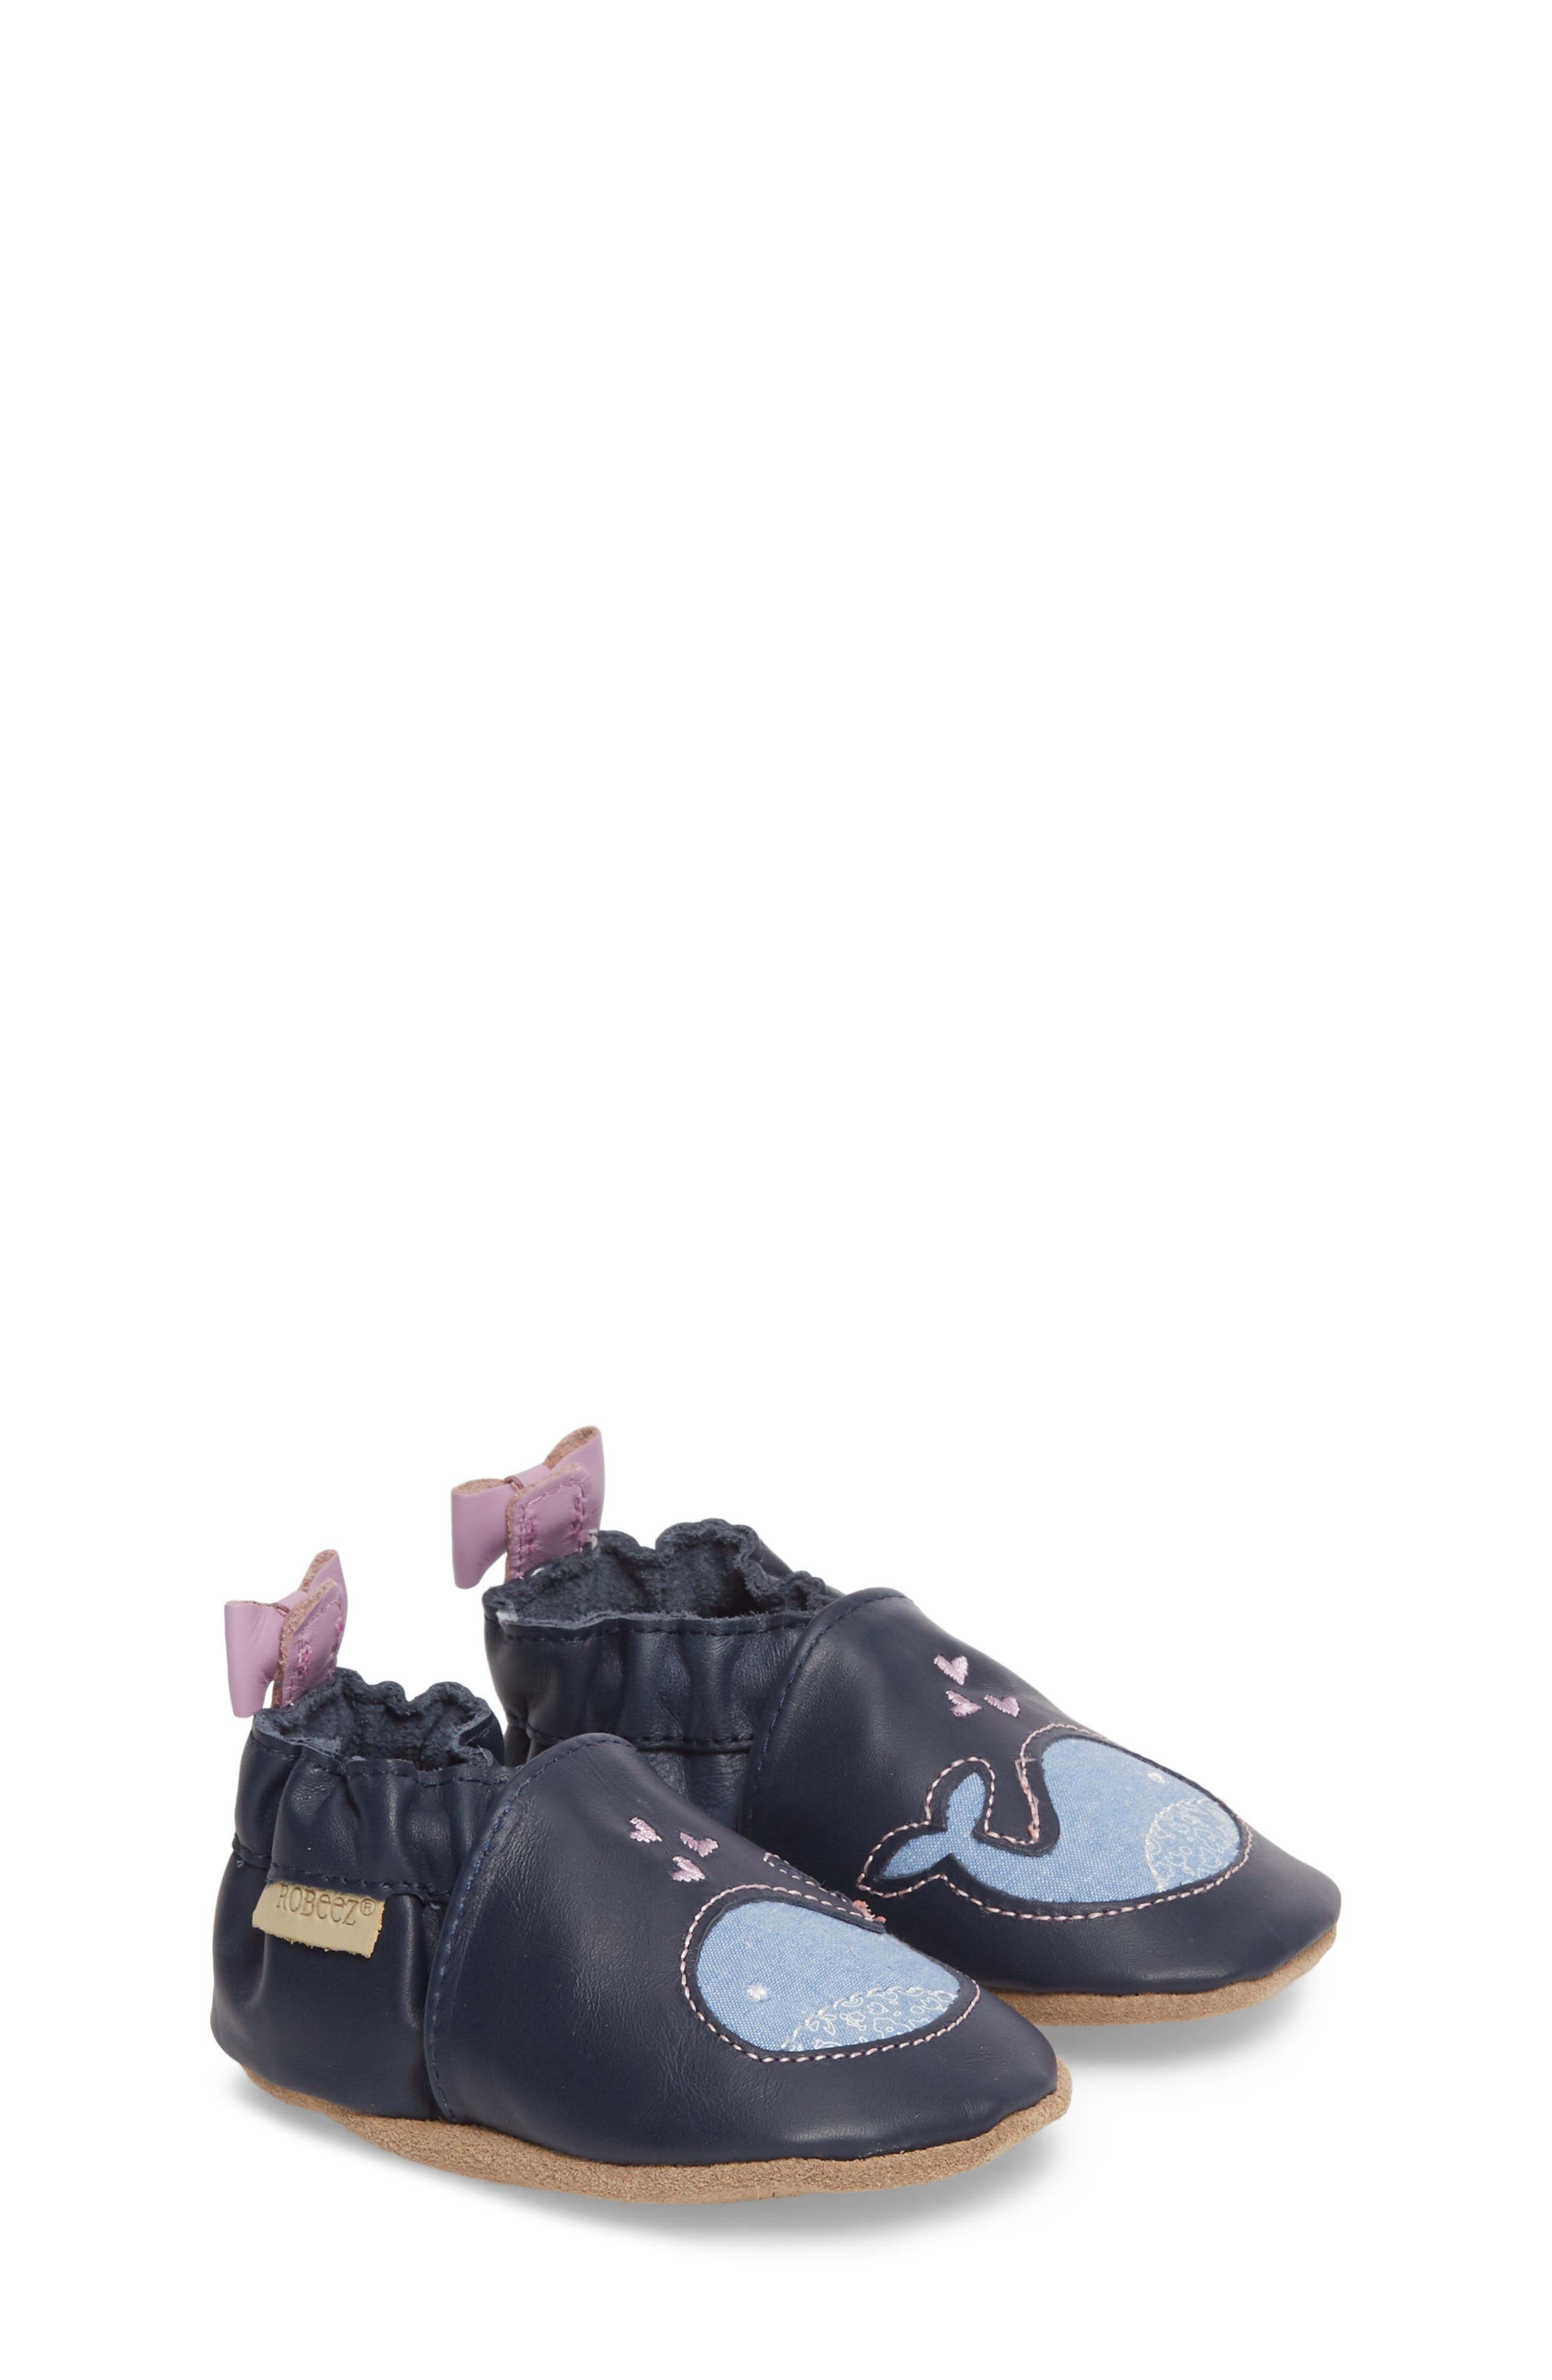 Poppy Whale Crib Shoe,                             Main thumbnail 1, color,                             NAVY